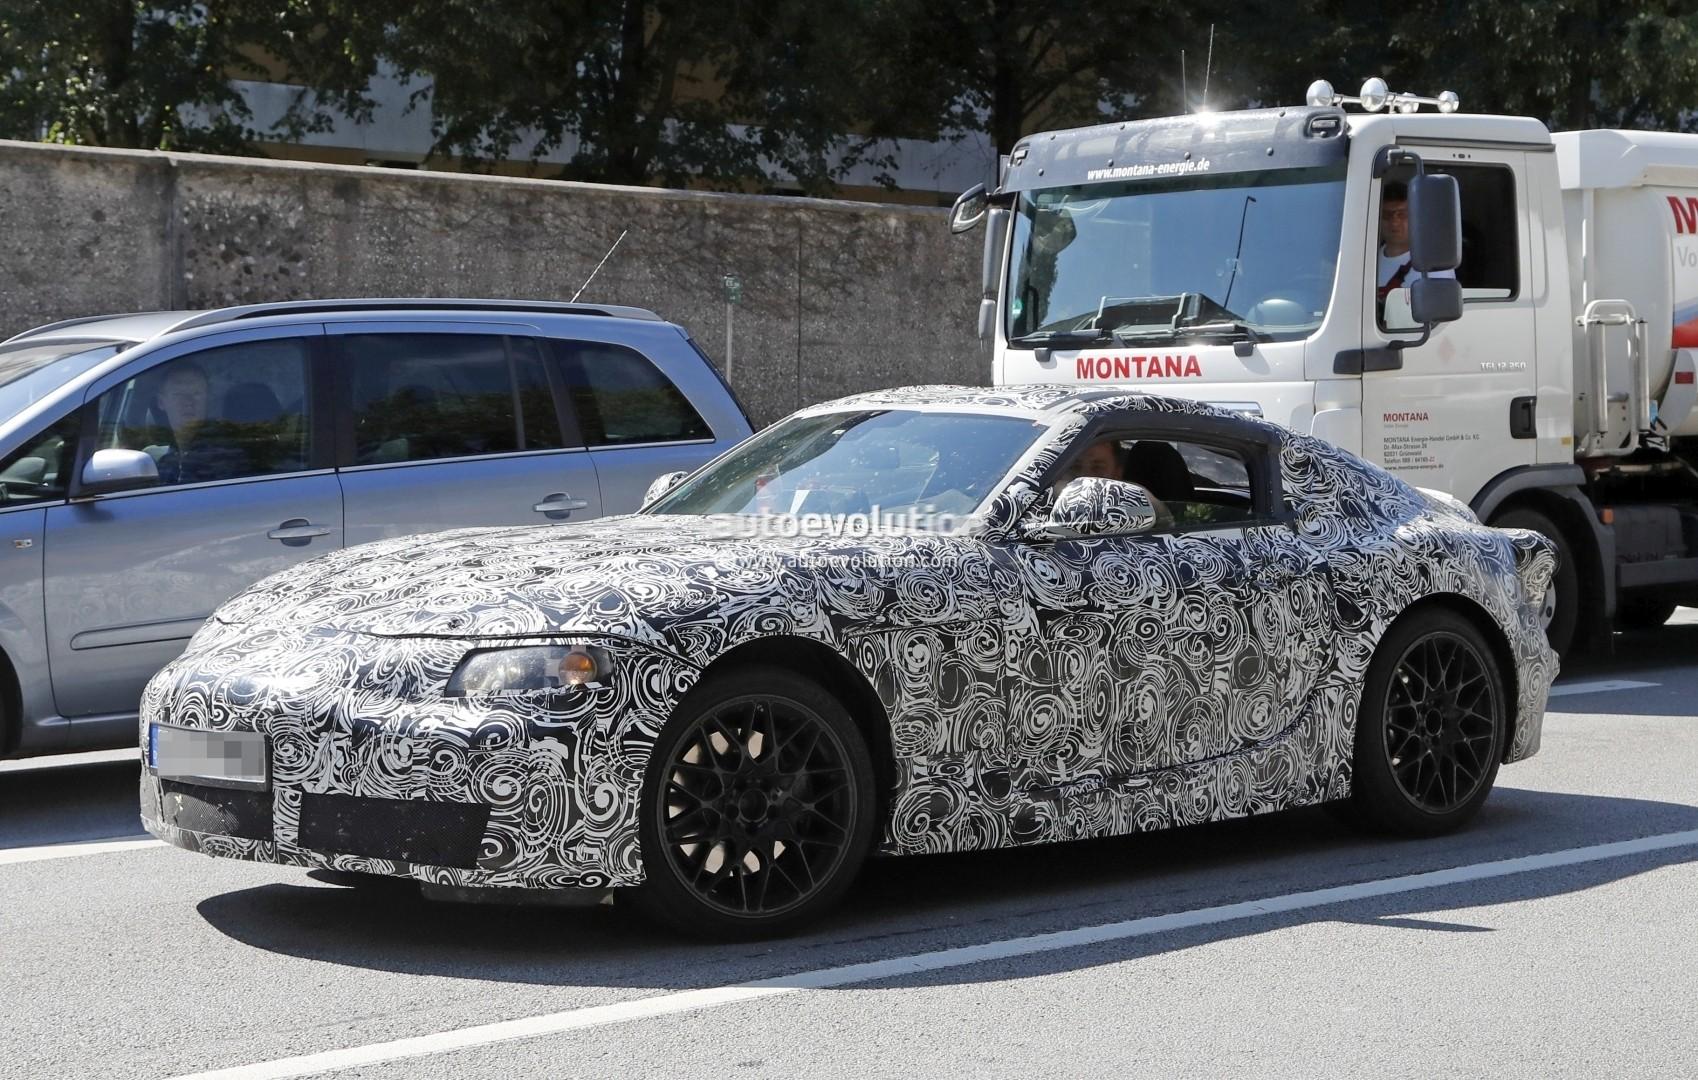 New 2018 Toyota Supra Makes Spyshot Debut Coupe Prototype